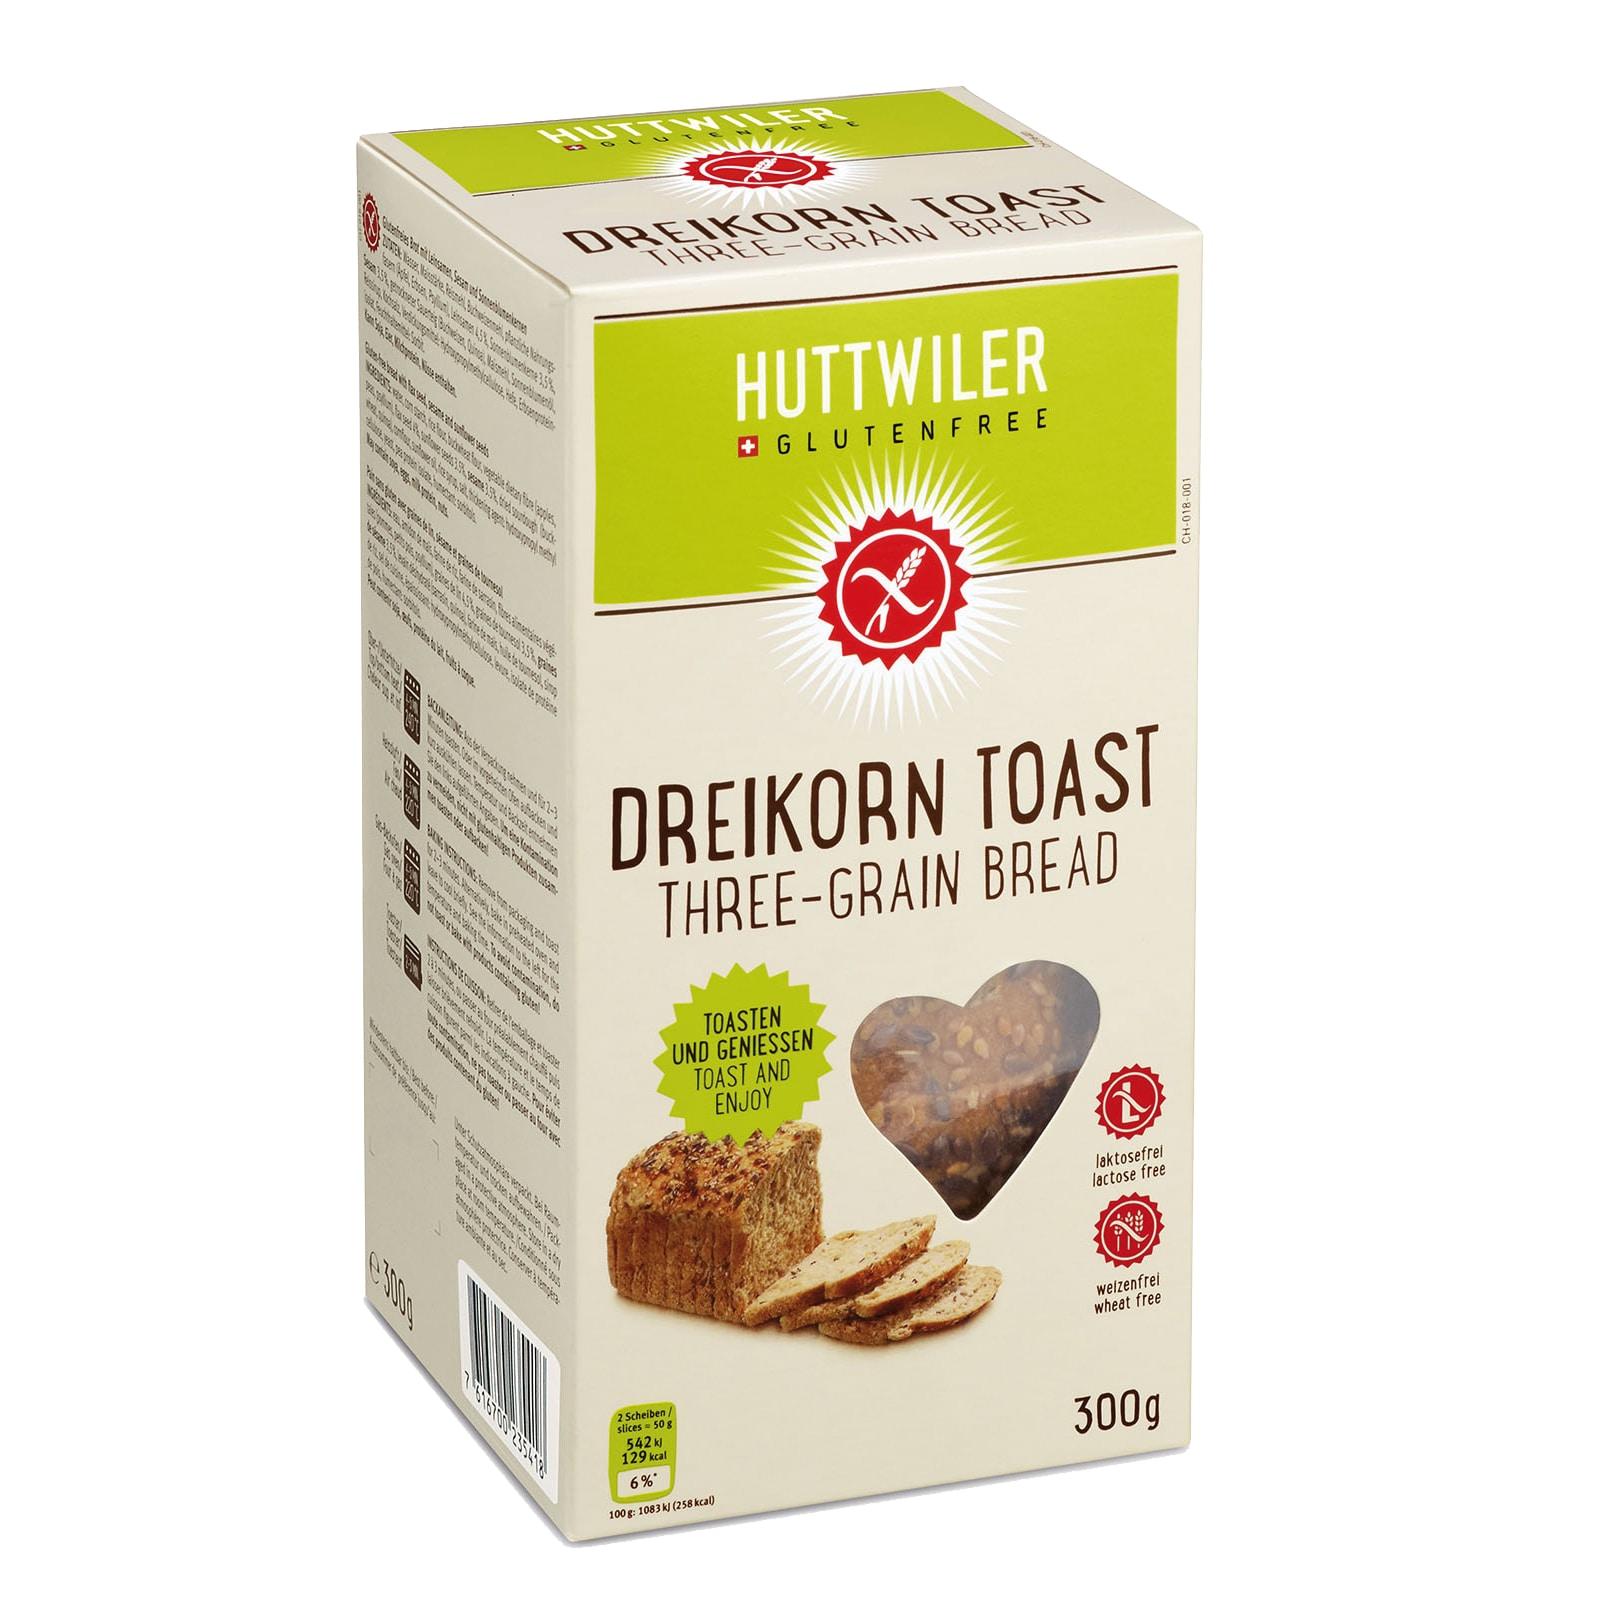 Huttwiler Dreikorn Toast 600g